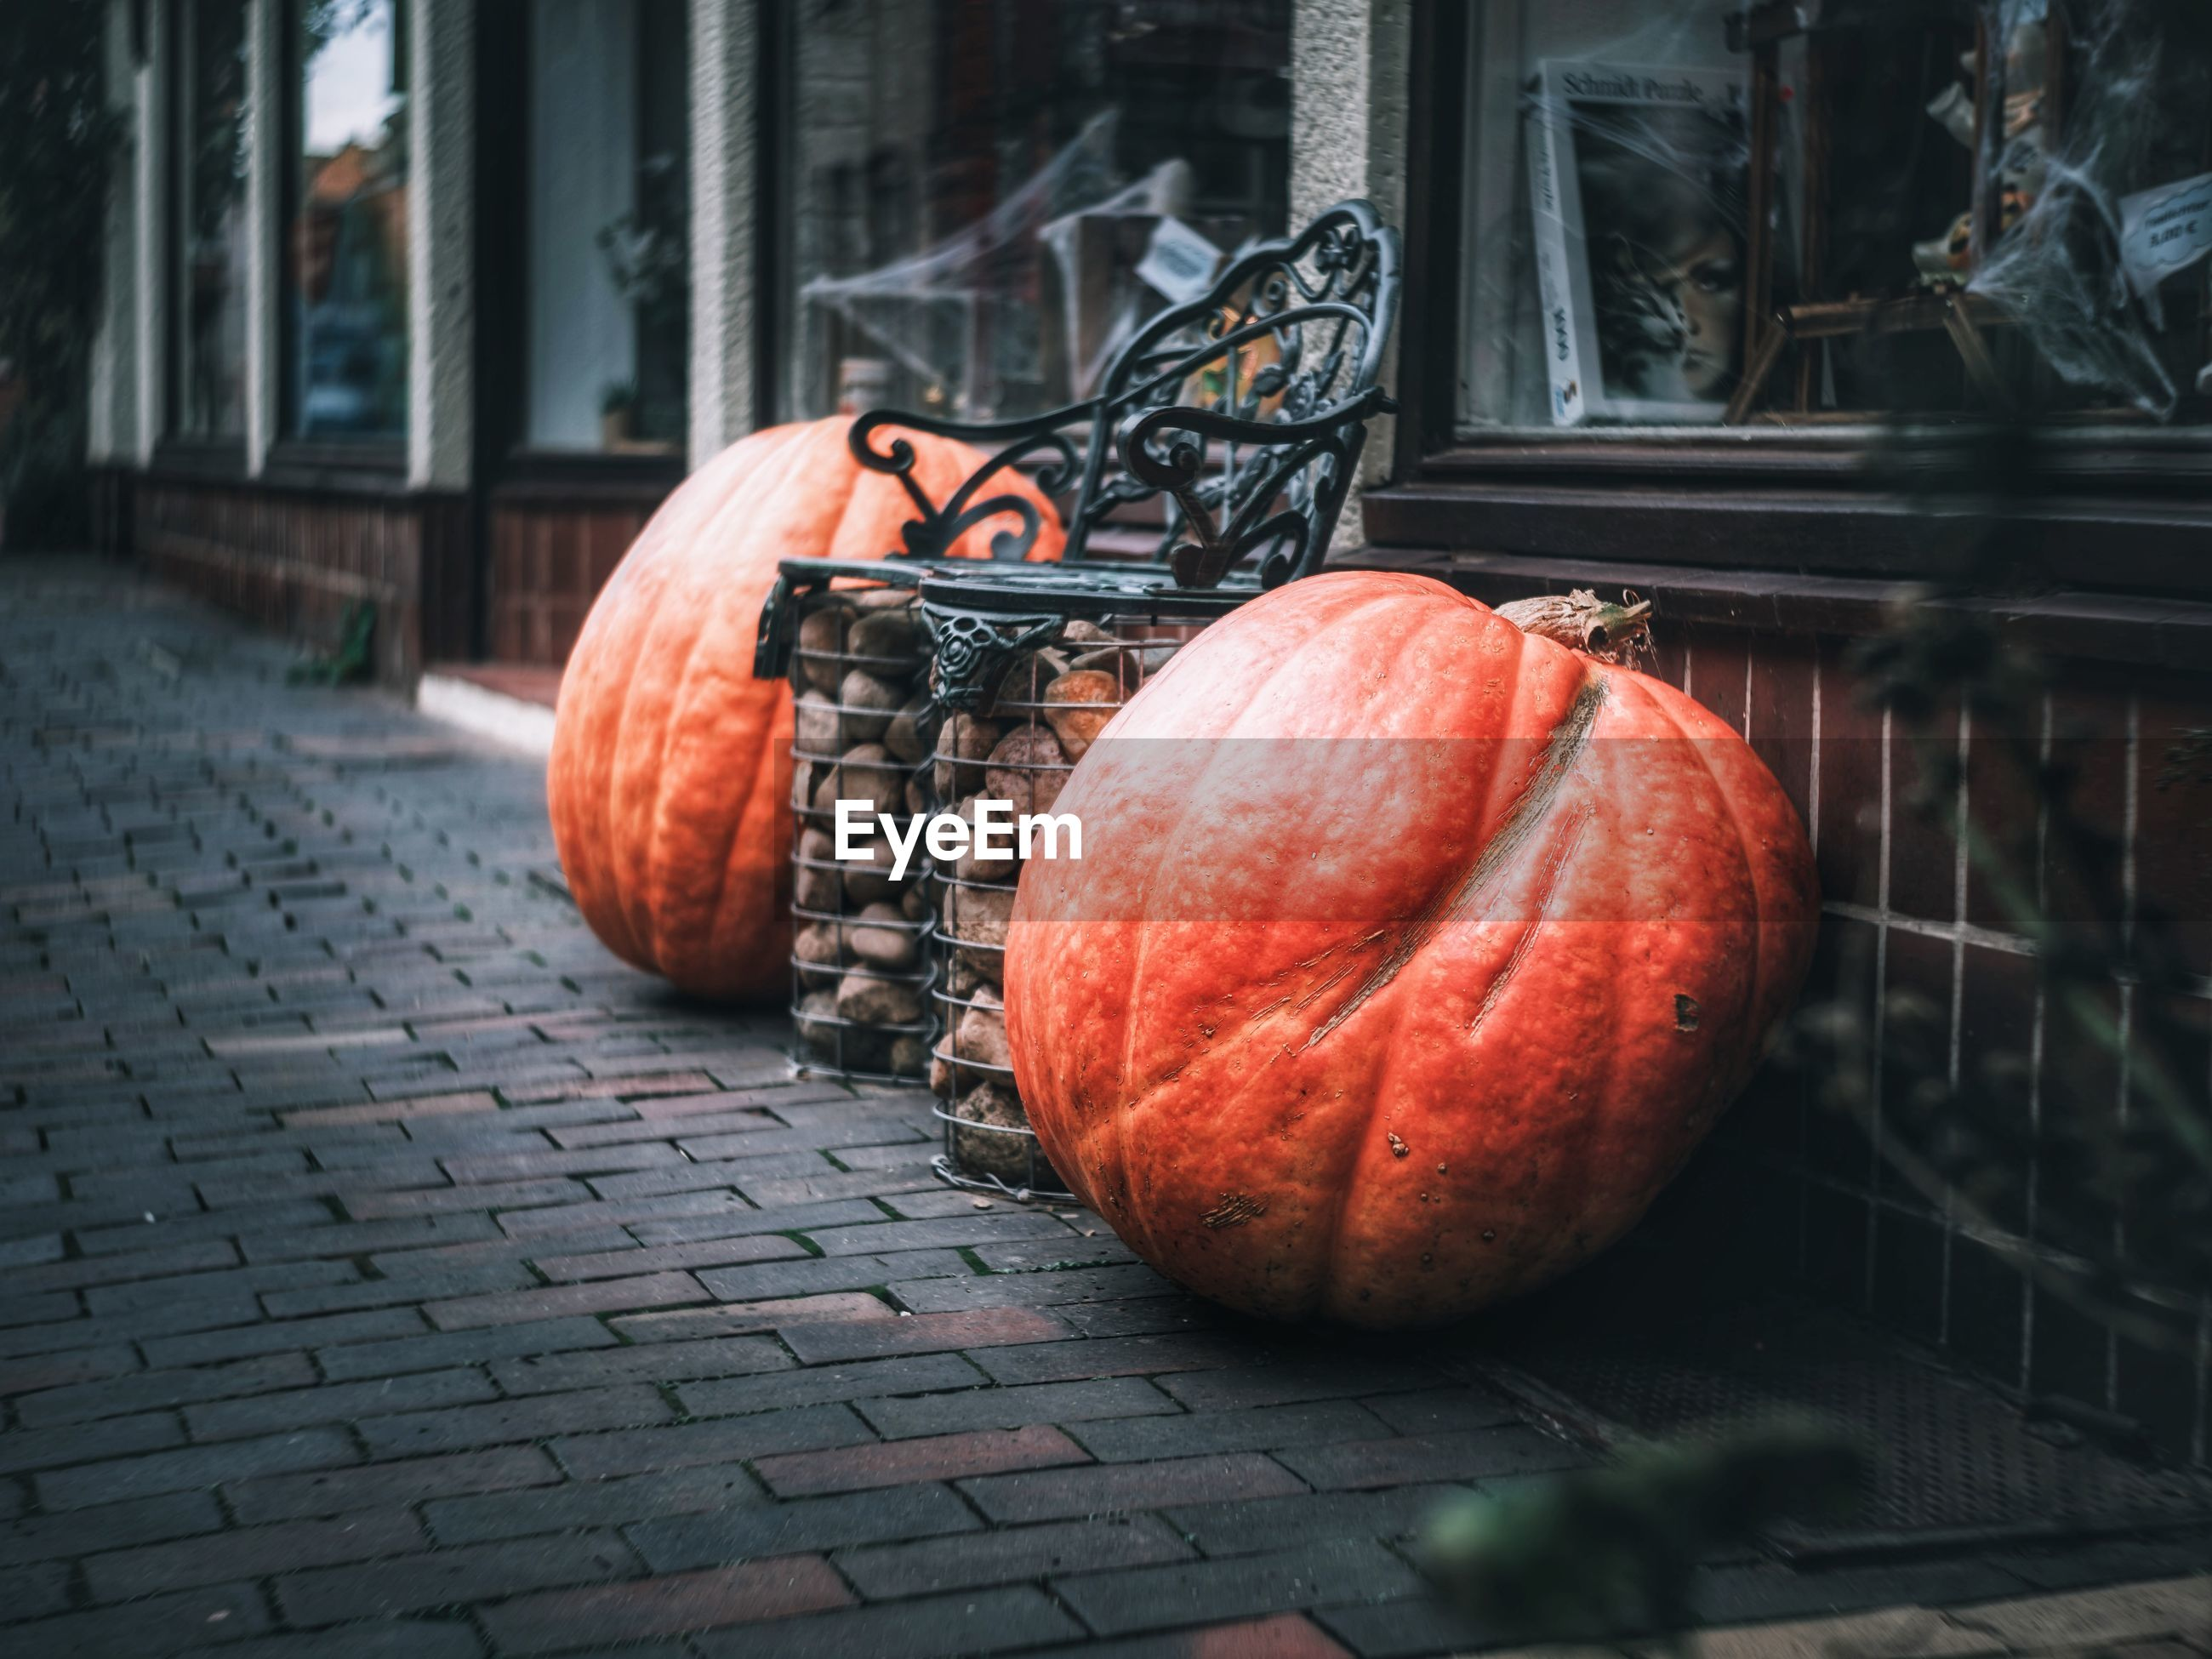 Two pumpkins framing a bench